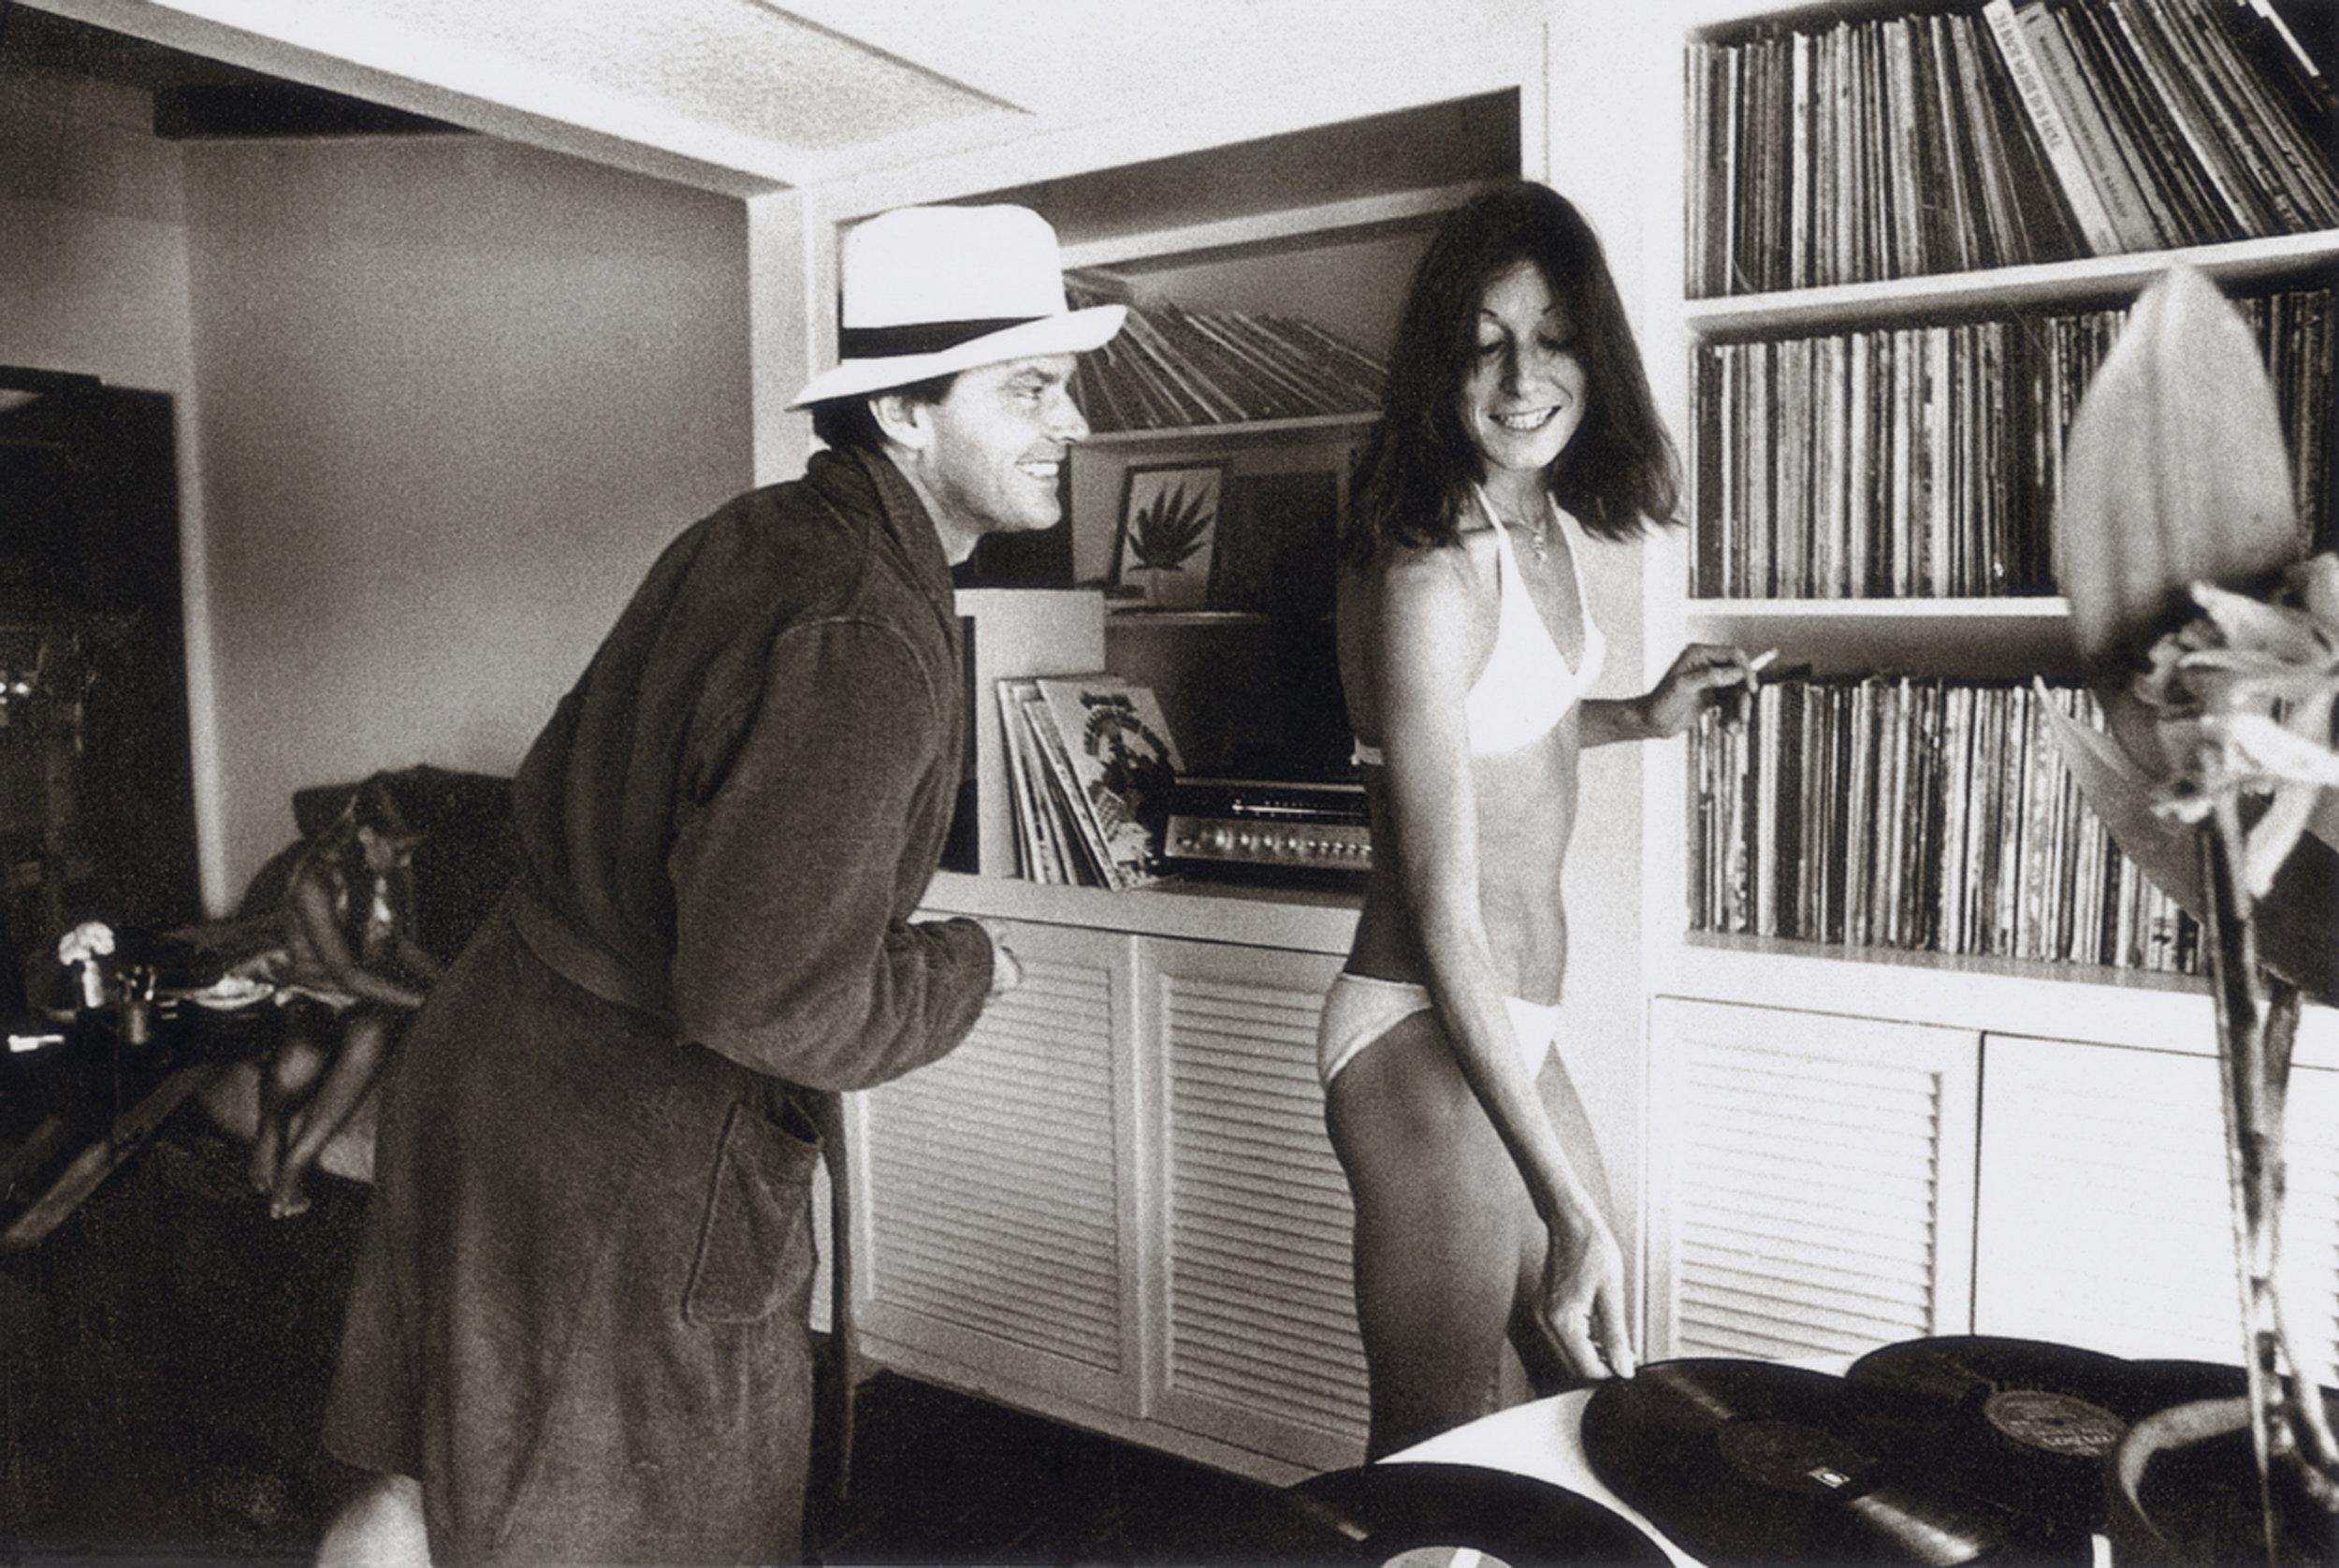 Jack Nicholson & Anjelica Huston. Photo credit Julian Wasser